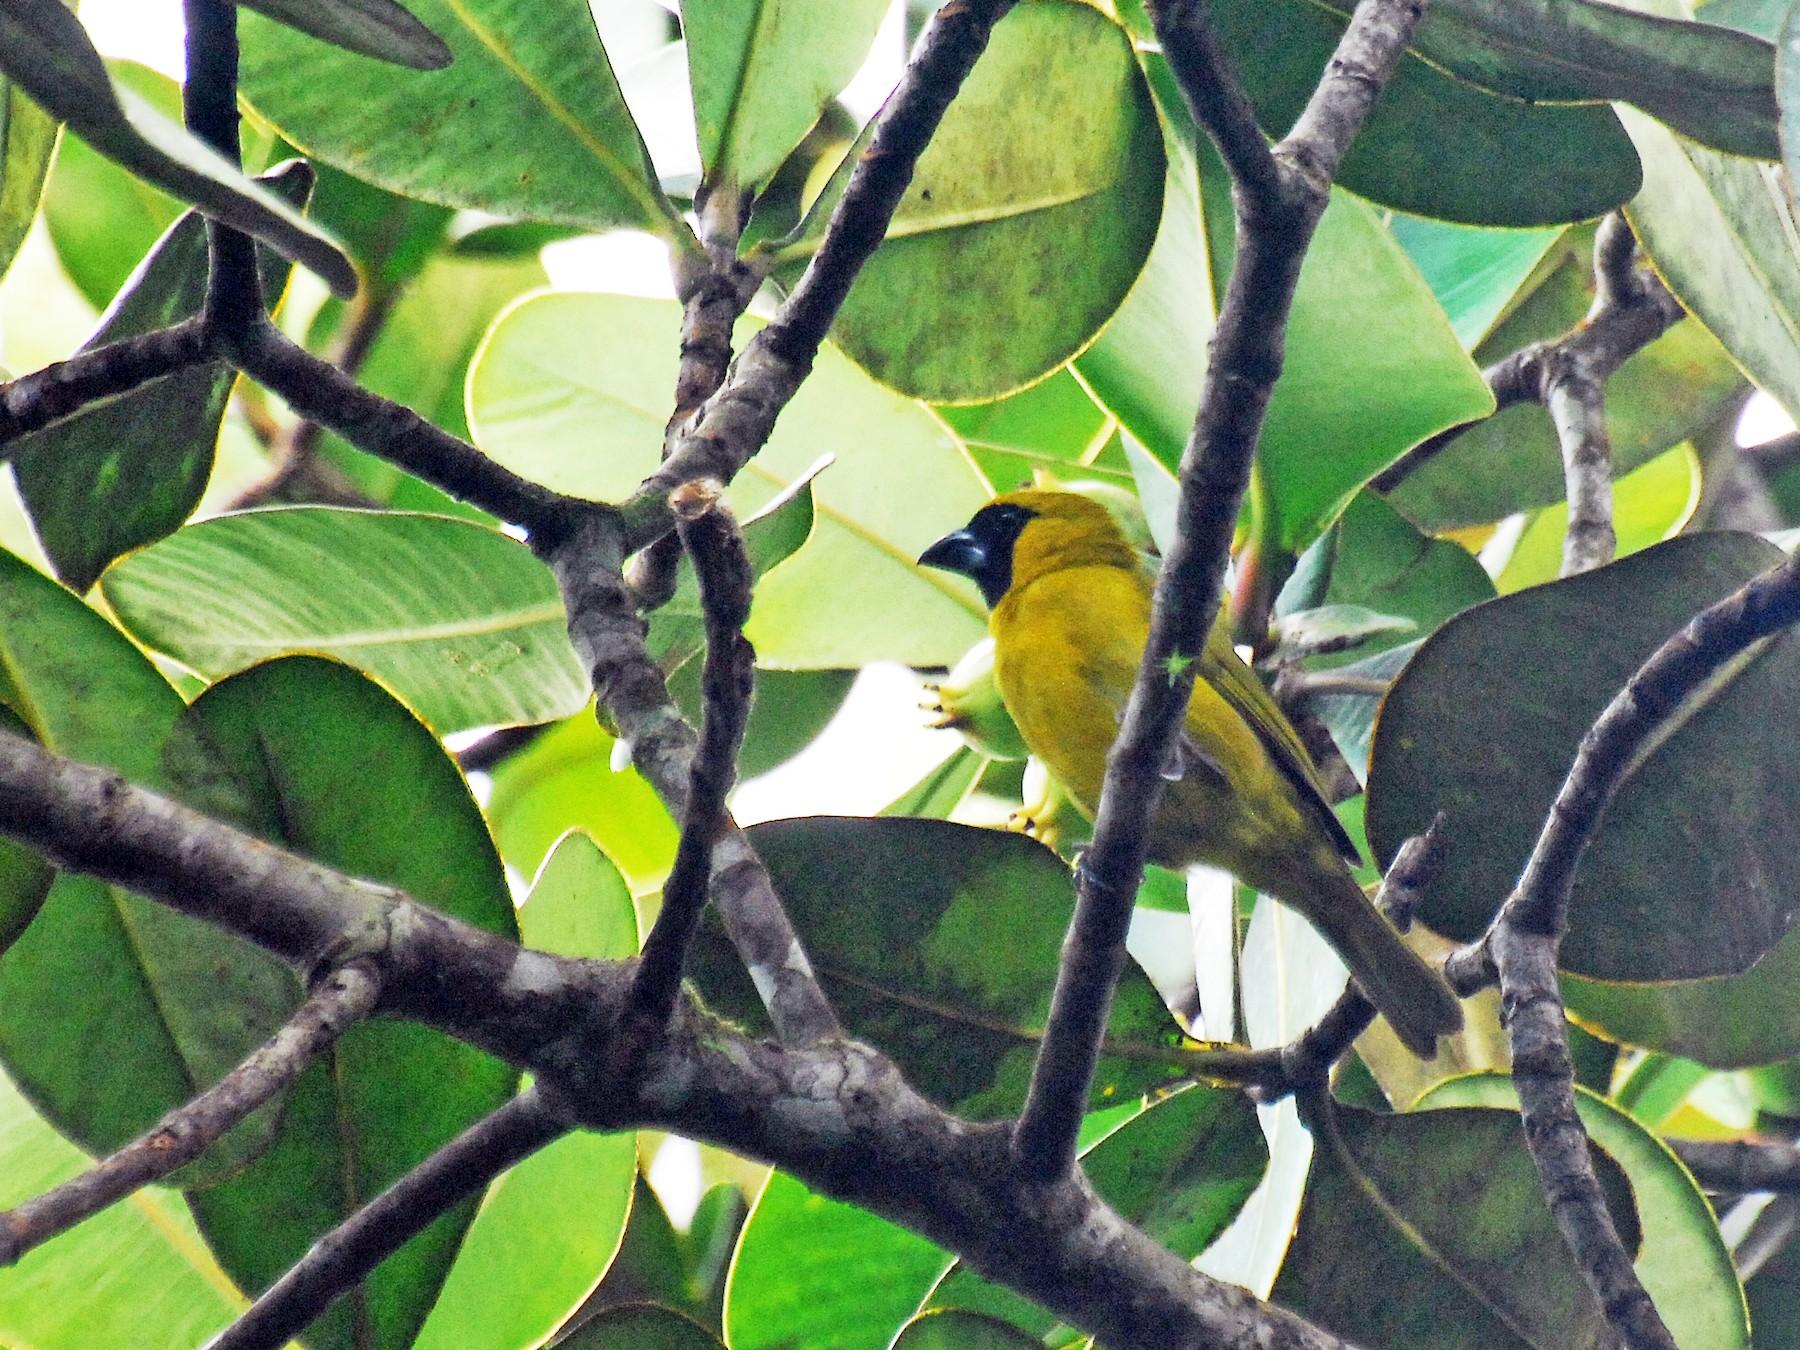 Yellow-green Grosbeak - David M. Bell